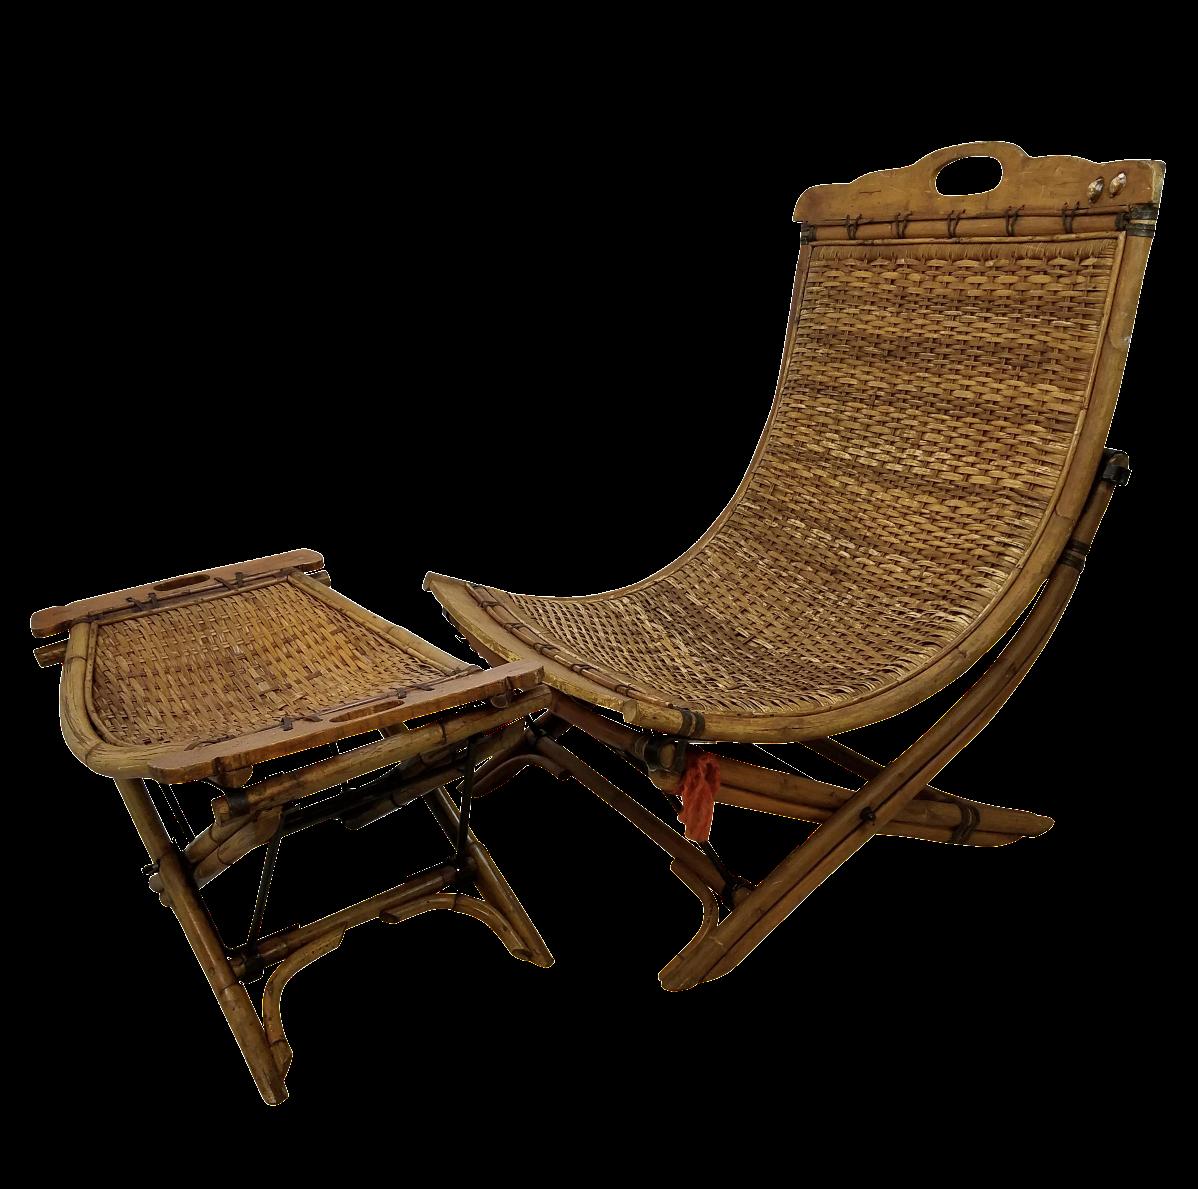 Vintage rattan chair - Vintage Rattan Chair 5